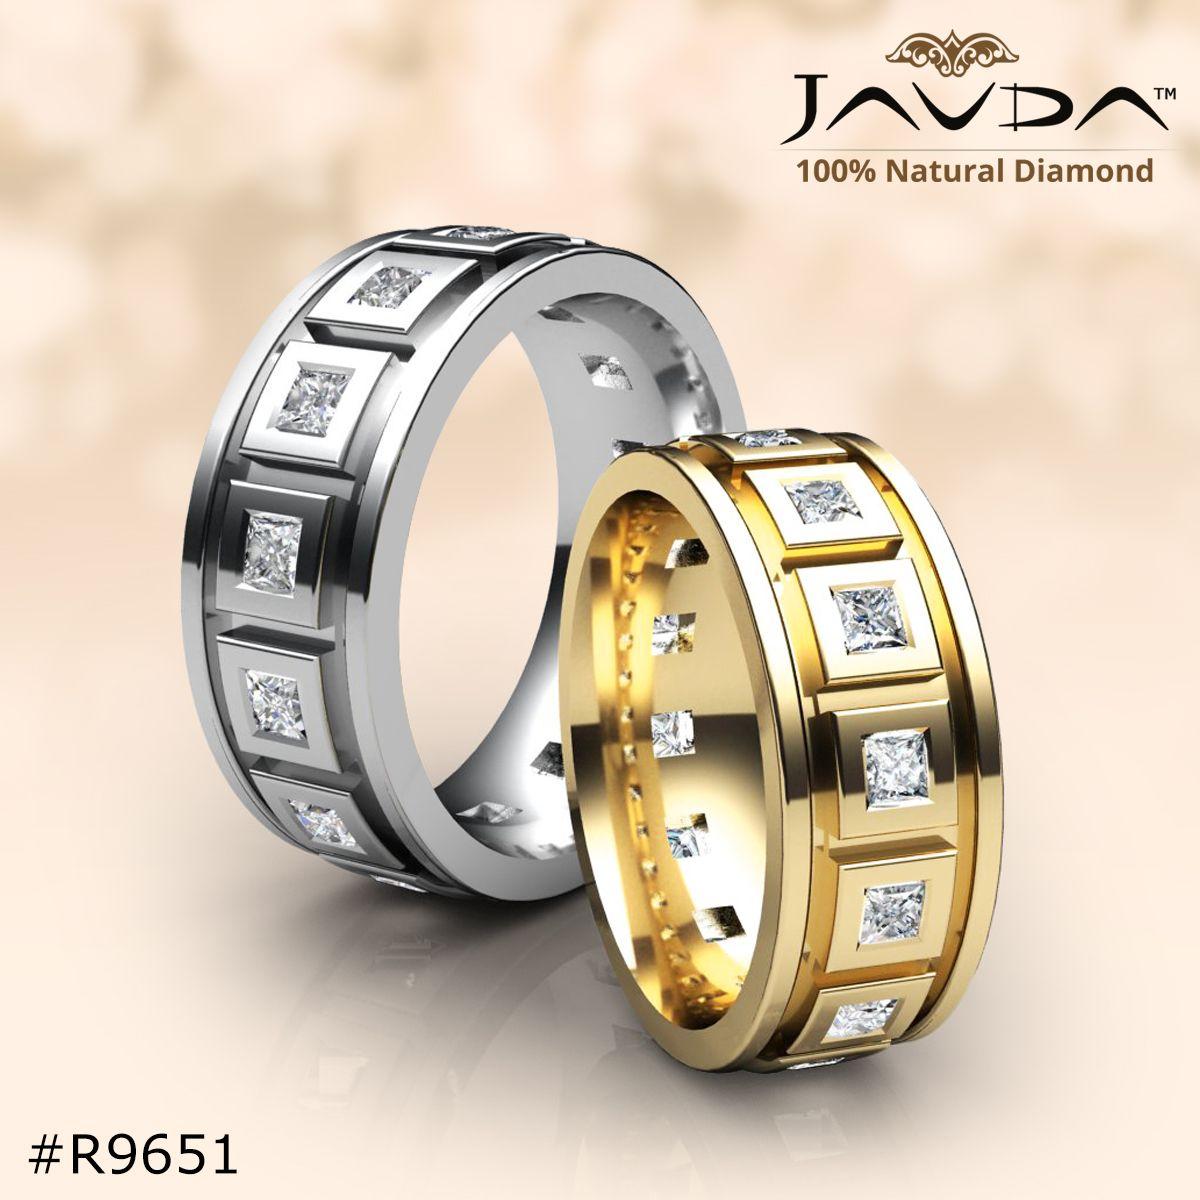 Fanciable men's eternity and half diamond weddingband made